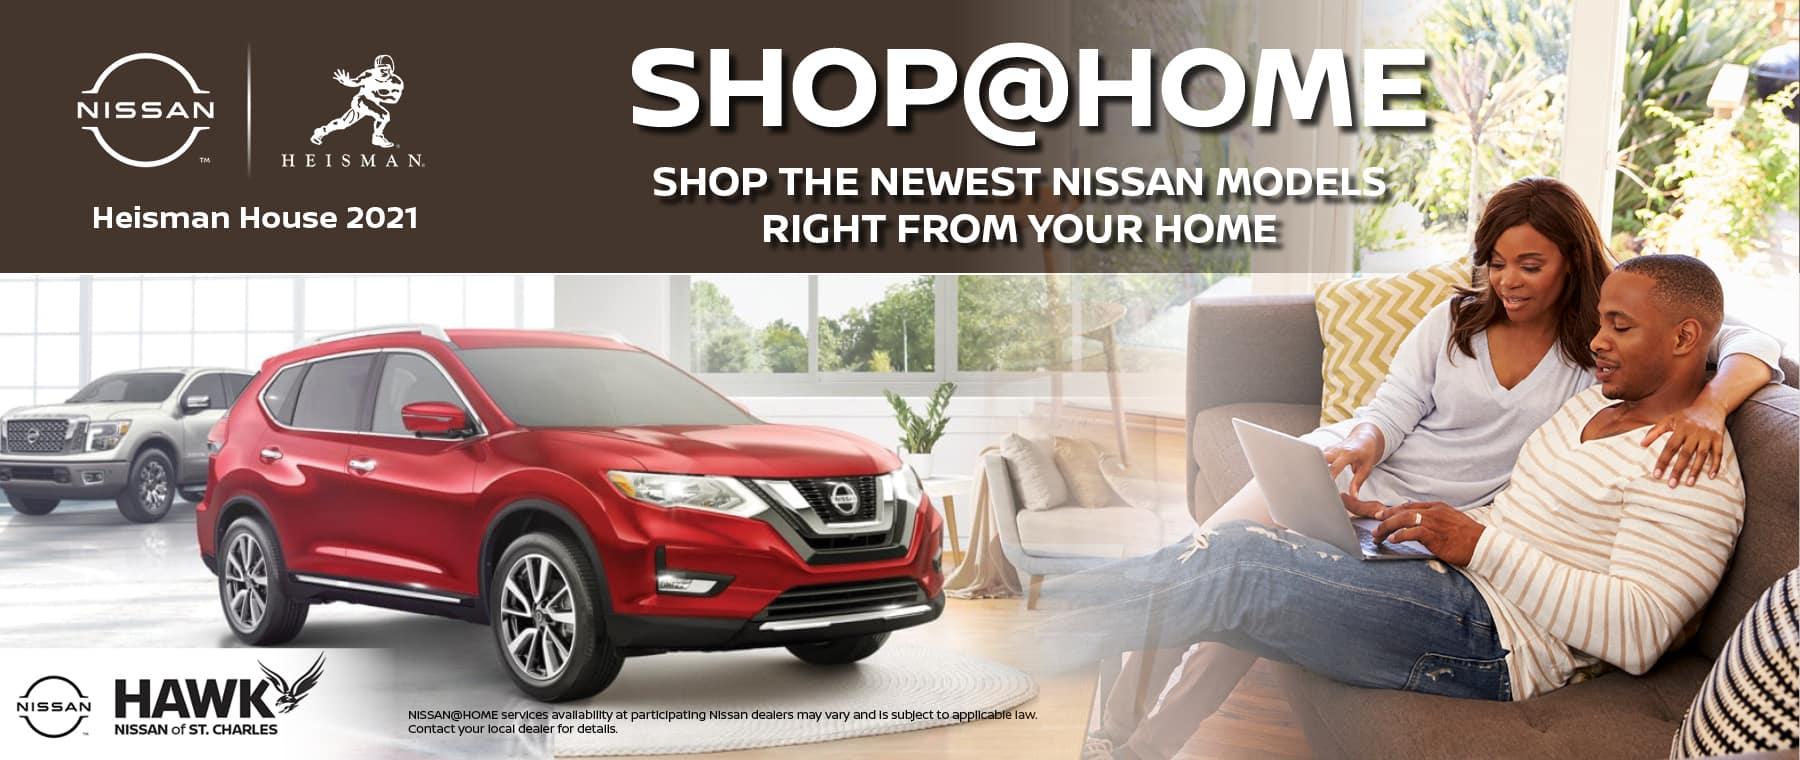 Shop at Home | Hawk Nissan of St. Charles